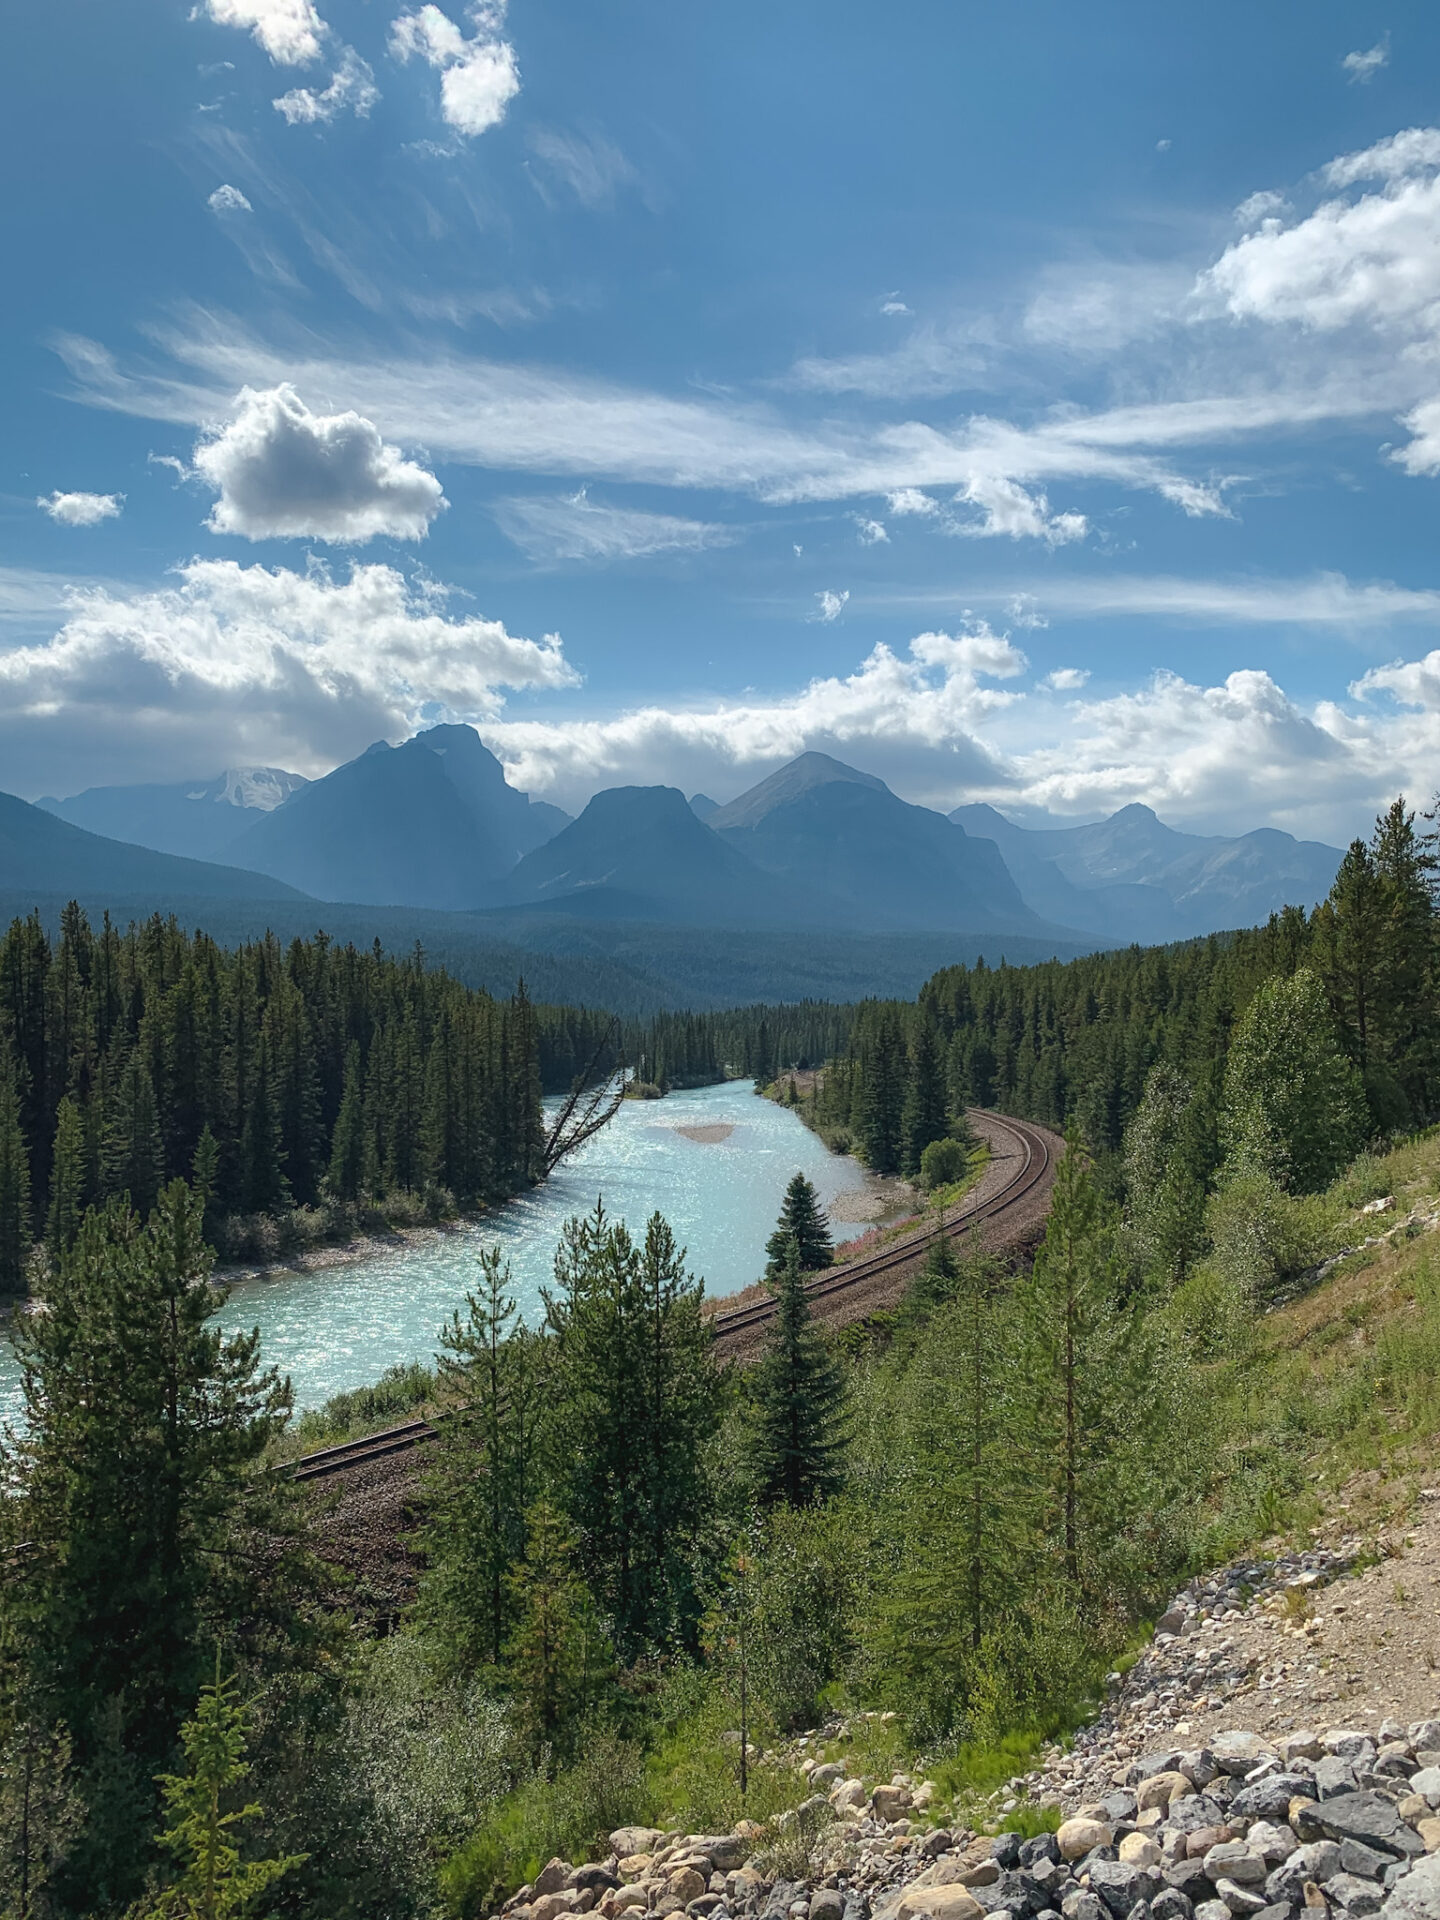 Morant's Curve viewpoint in Banff, Alberta